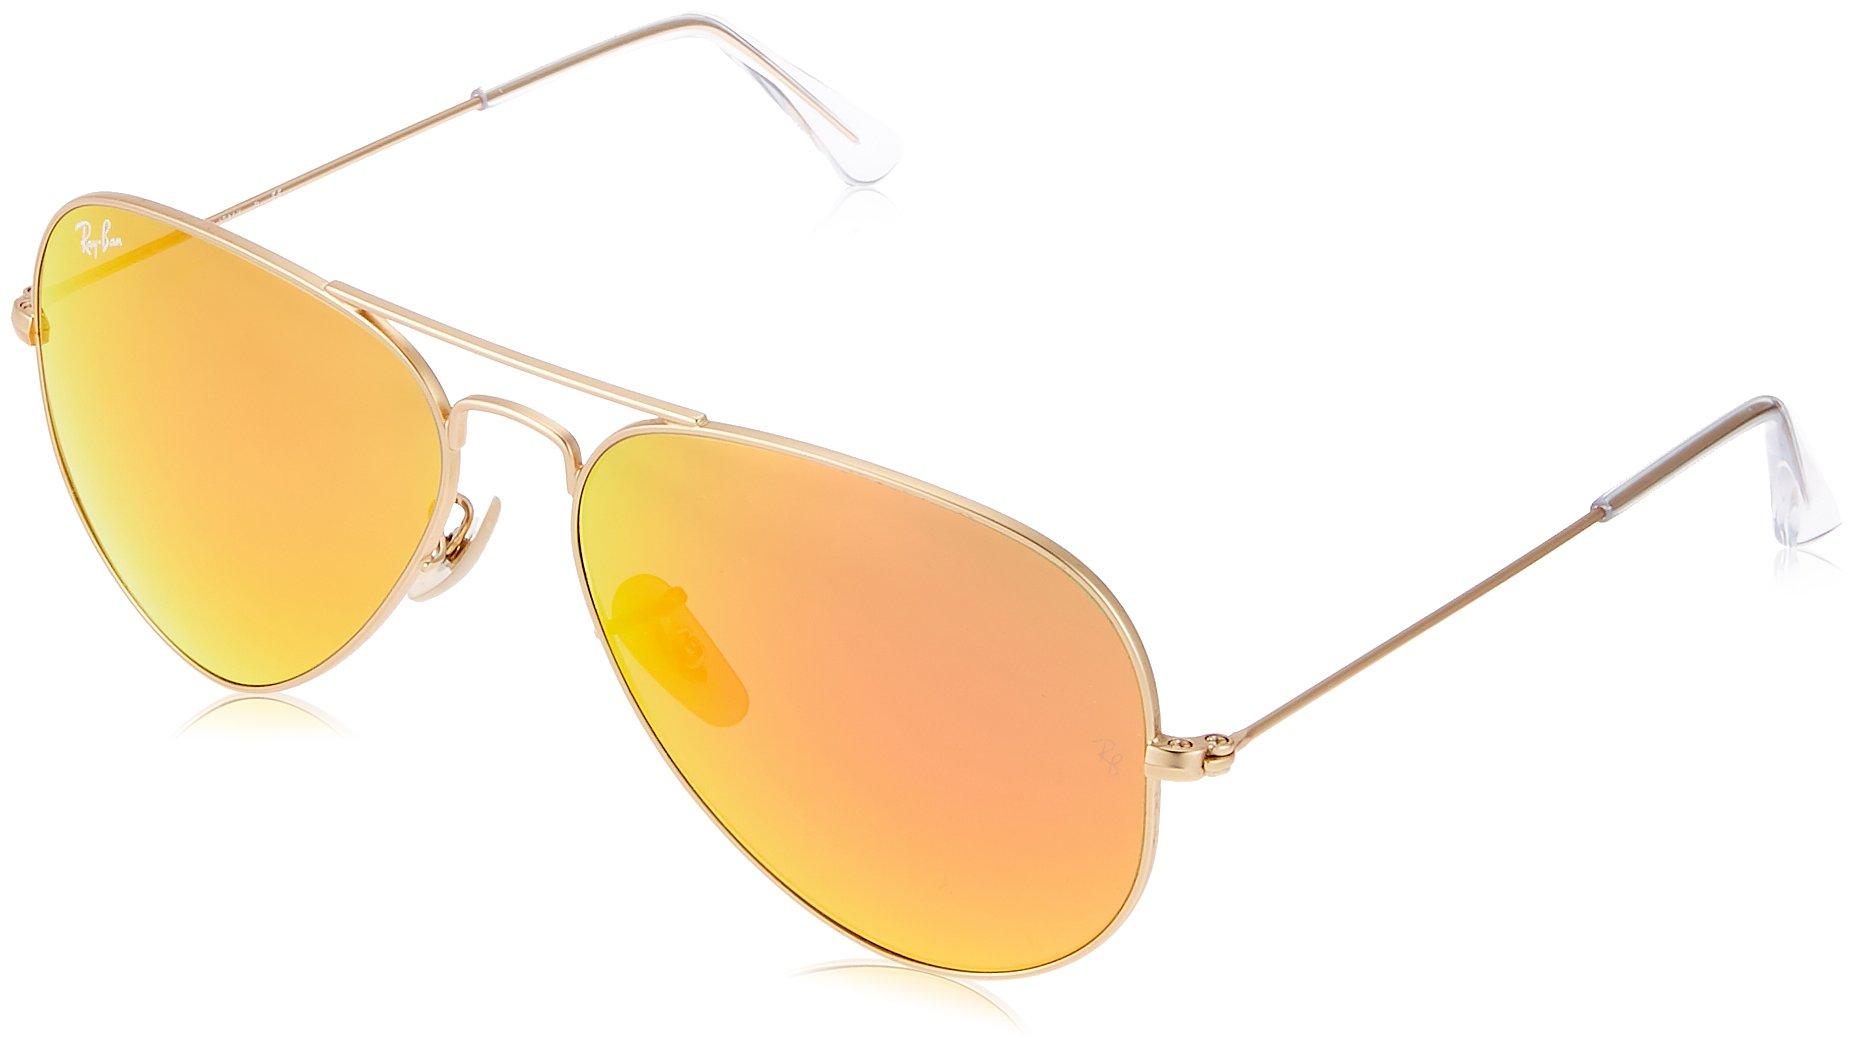 Ray-Ban AVIATOR LARGE METAL - MATTE GOLD Frame CRYSTAL BROWN MIRROR ORANGE Lenses 58mm Non-Polarized